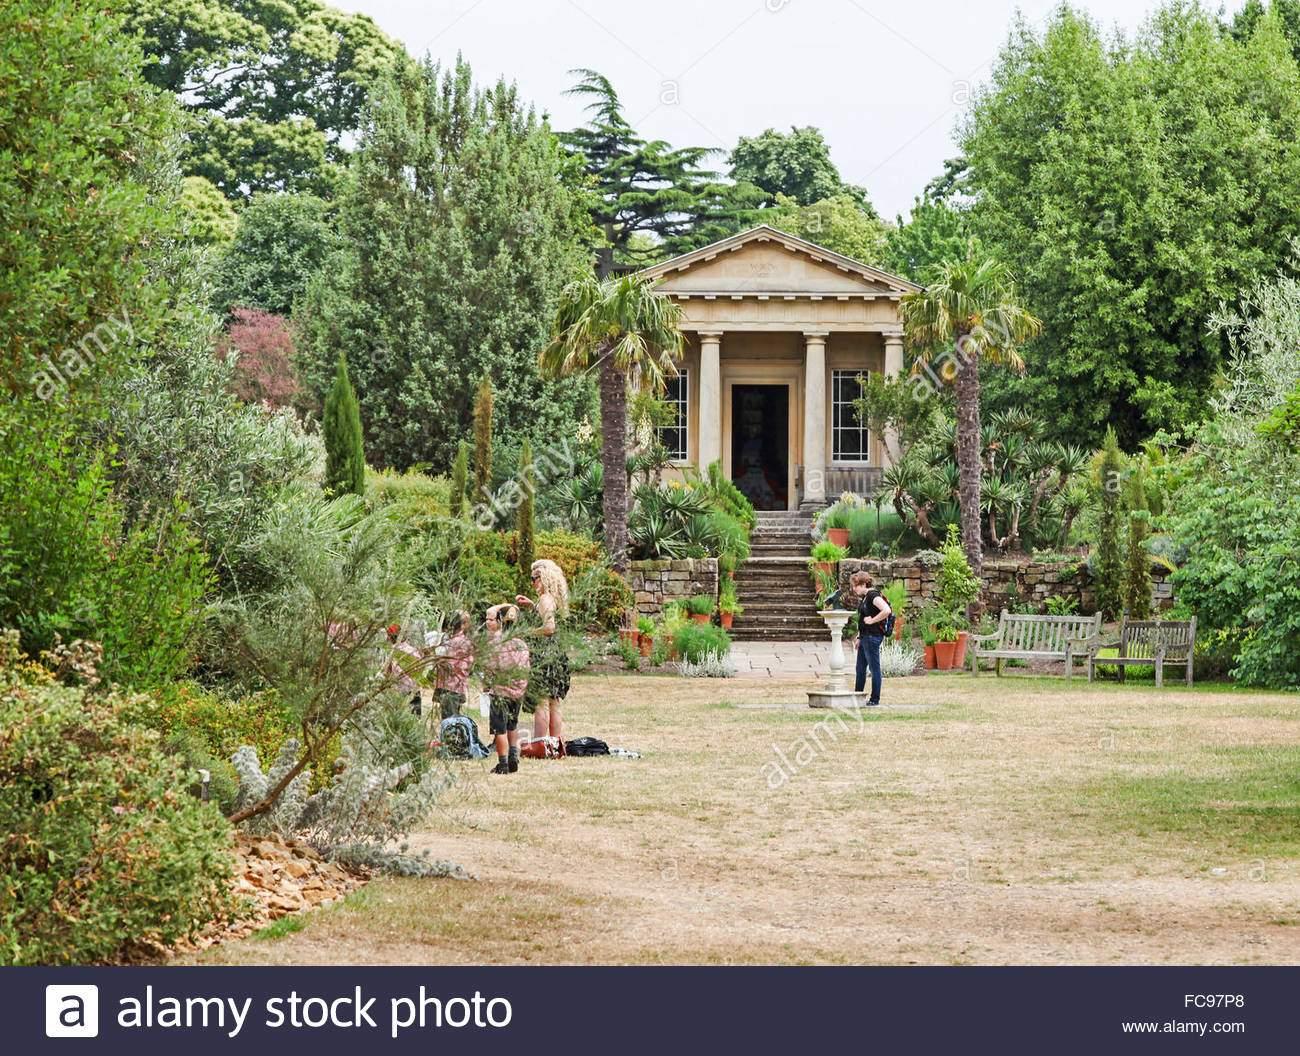 konig wilhelm tempelgarten mediterranen garten kew royal botanical gardens london england uk fc97p8